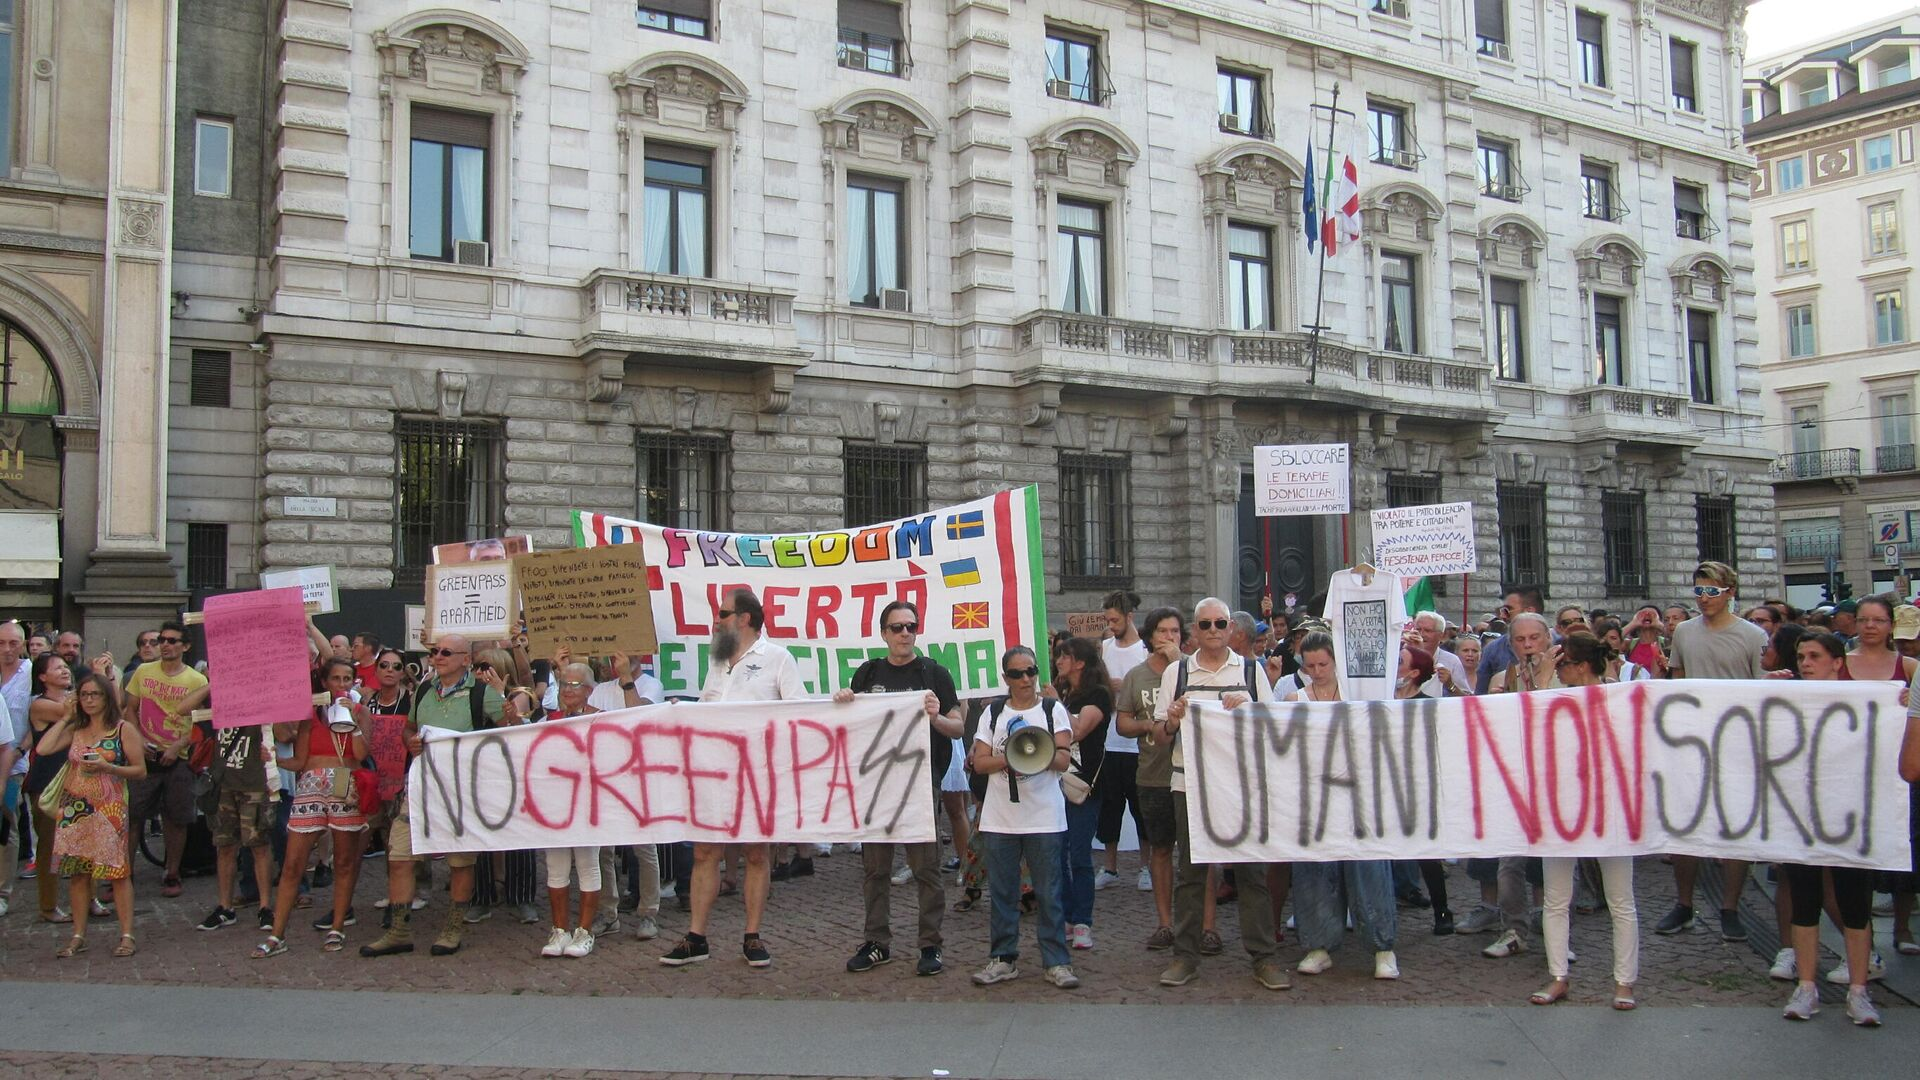 Manifestazione no Green pass a Milano  - Sputnik Italia, 1920, 25.09.2021